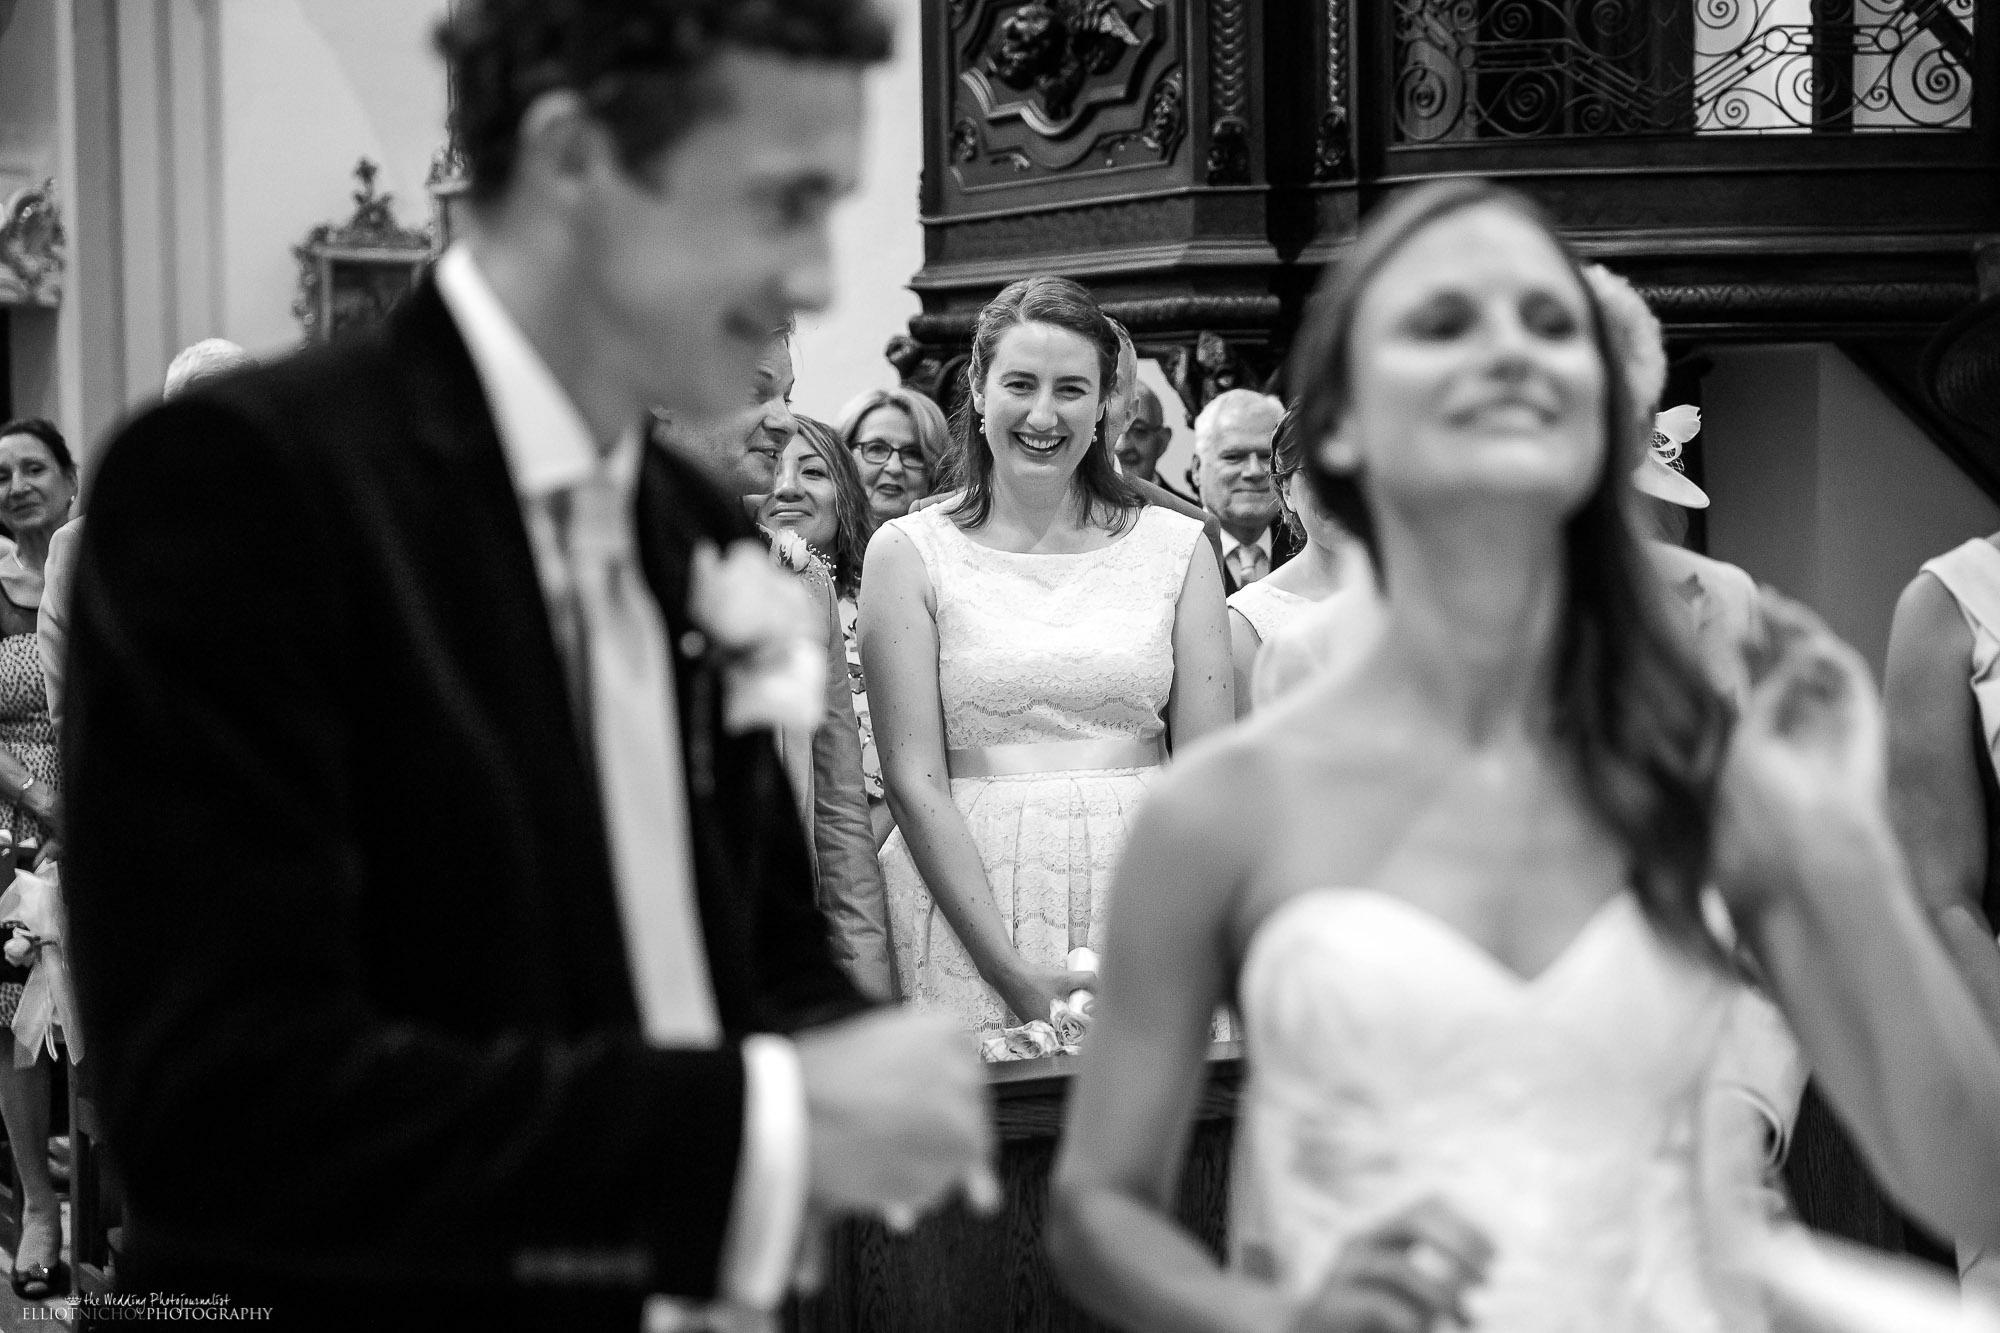 wedding-bridesmaid-church-ceremony-photographer